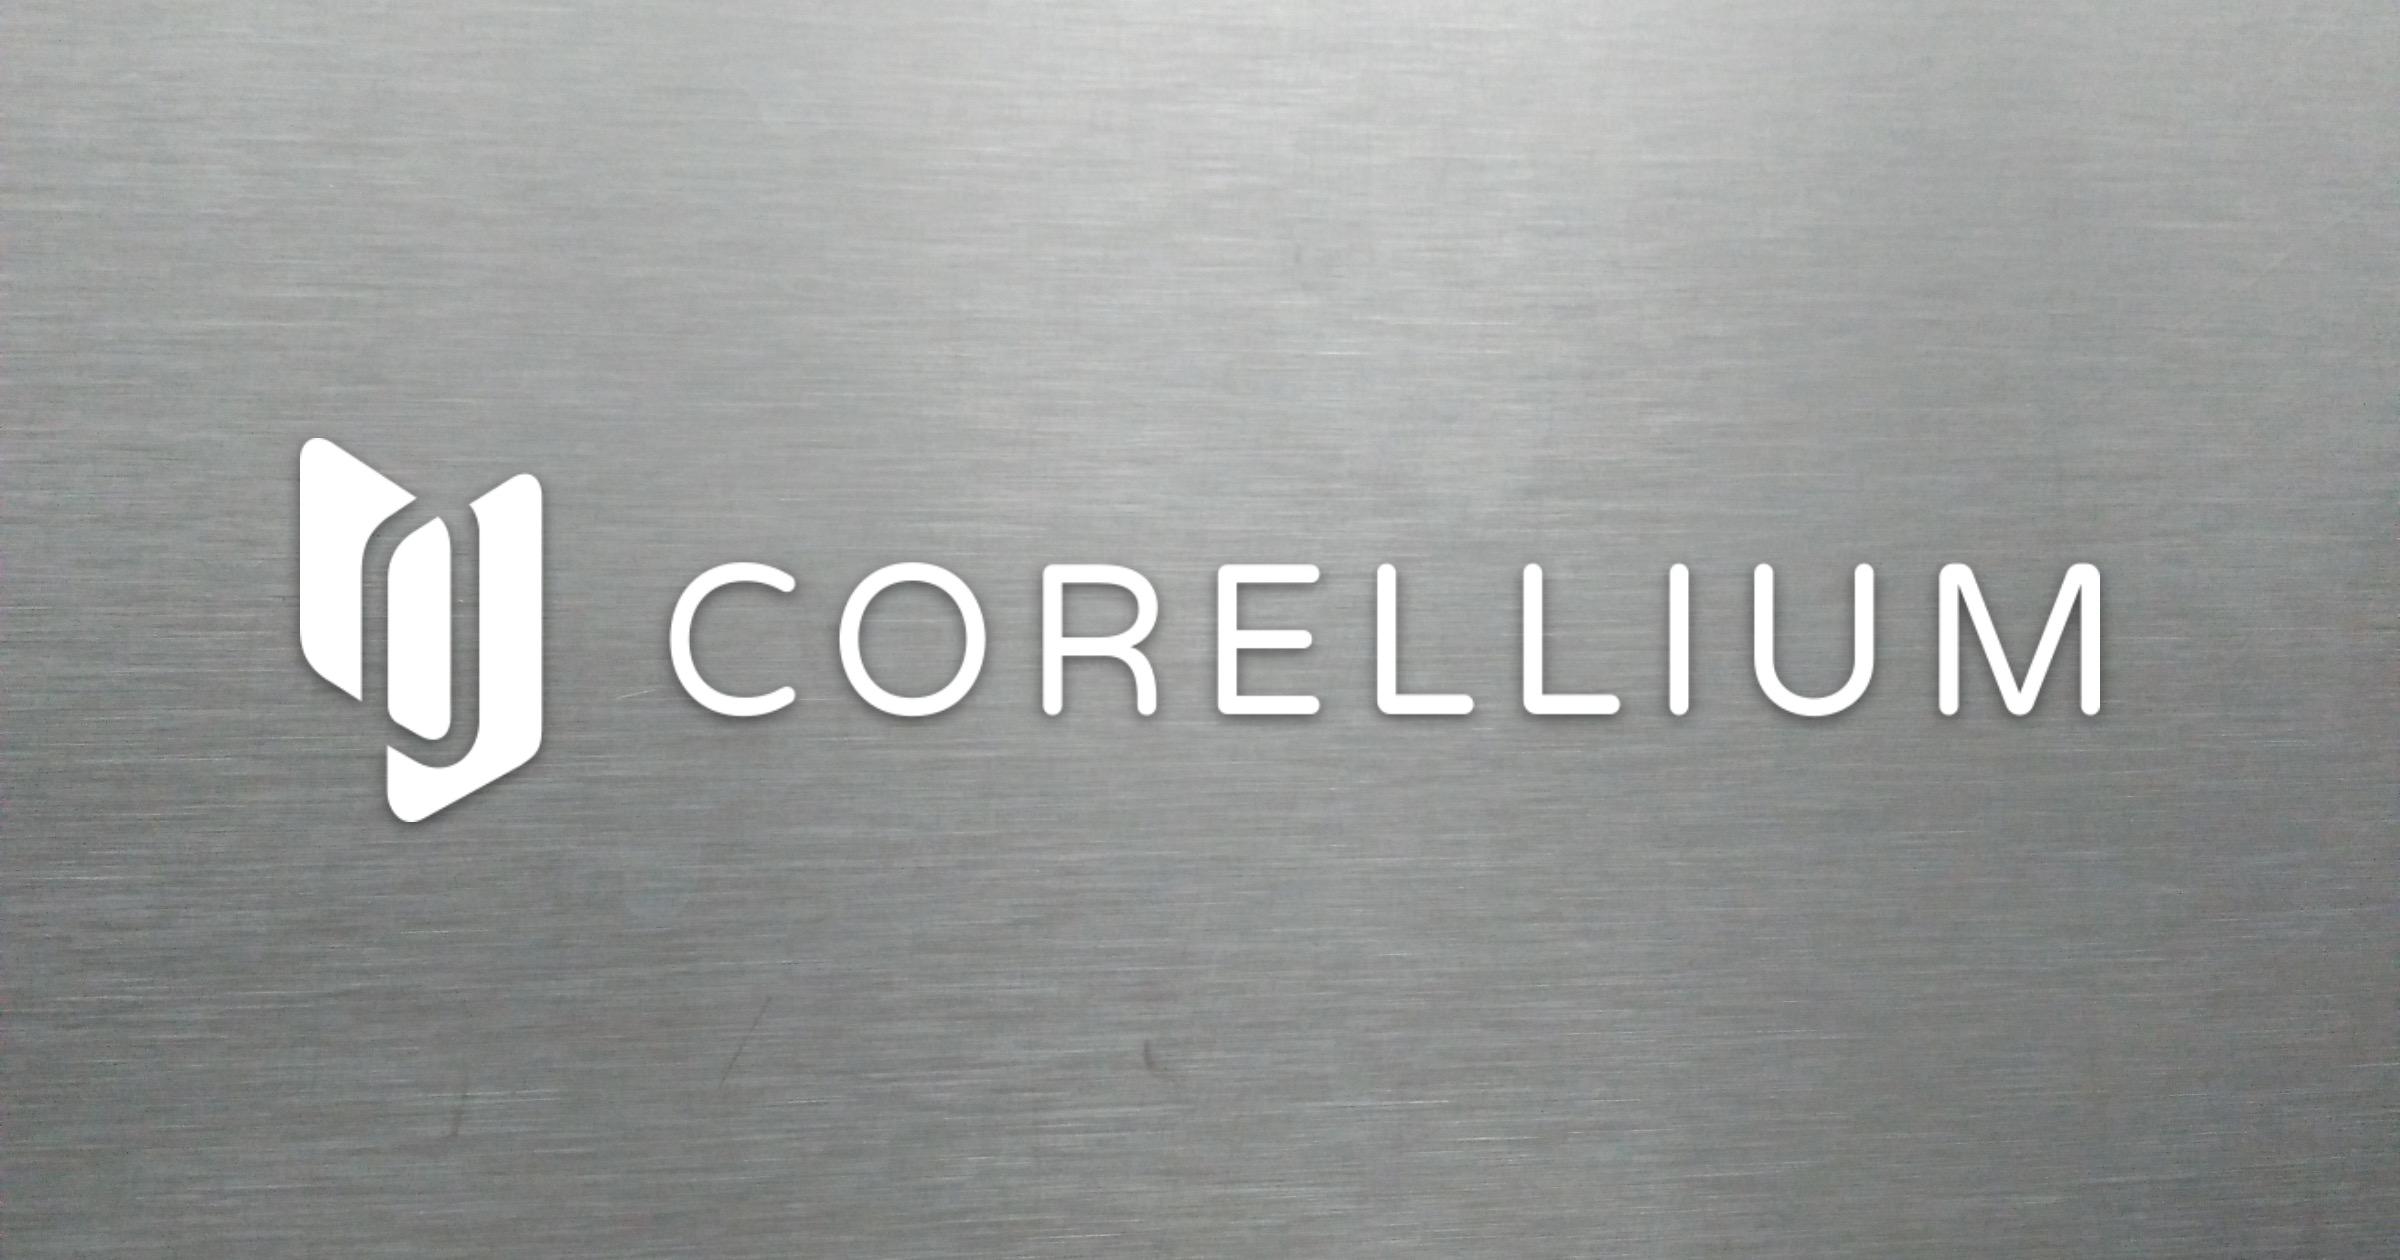 Corellium logo on metal